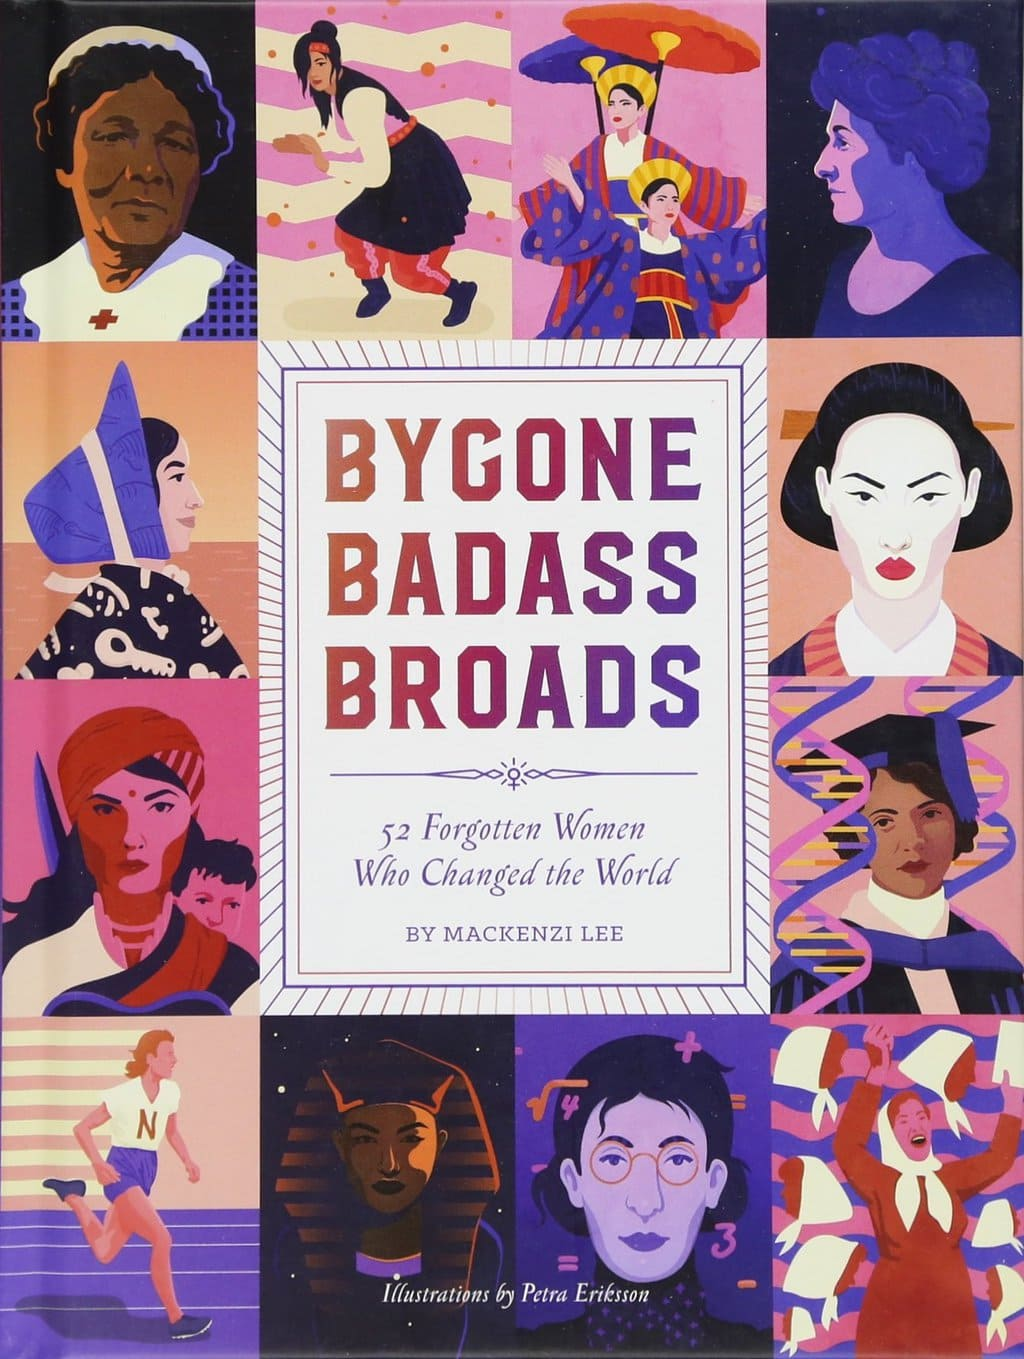 Bygone badass broads by Mackenzi Lee - Best books for women 2018